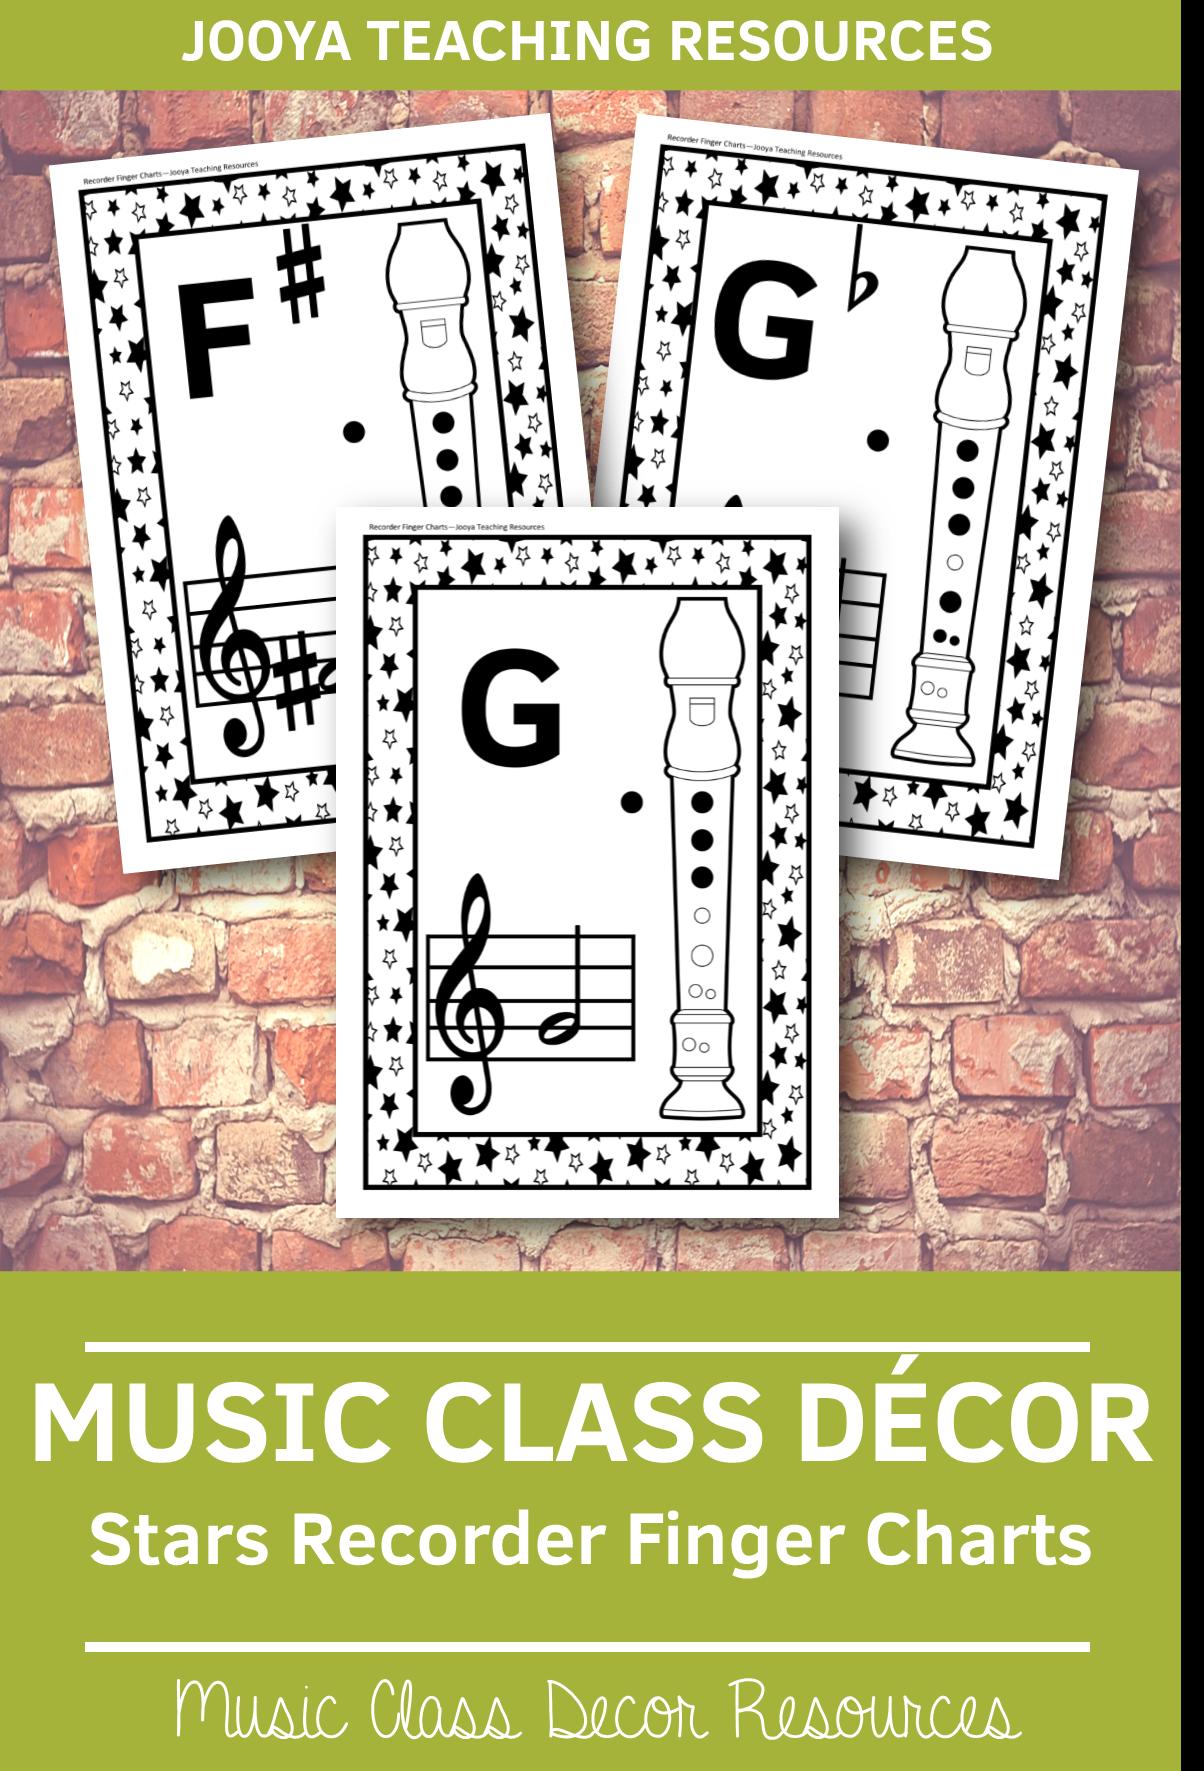 Music Class Decor